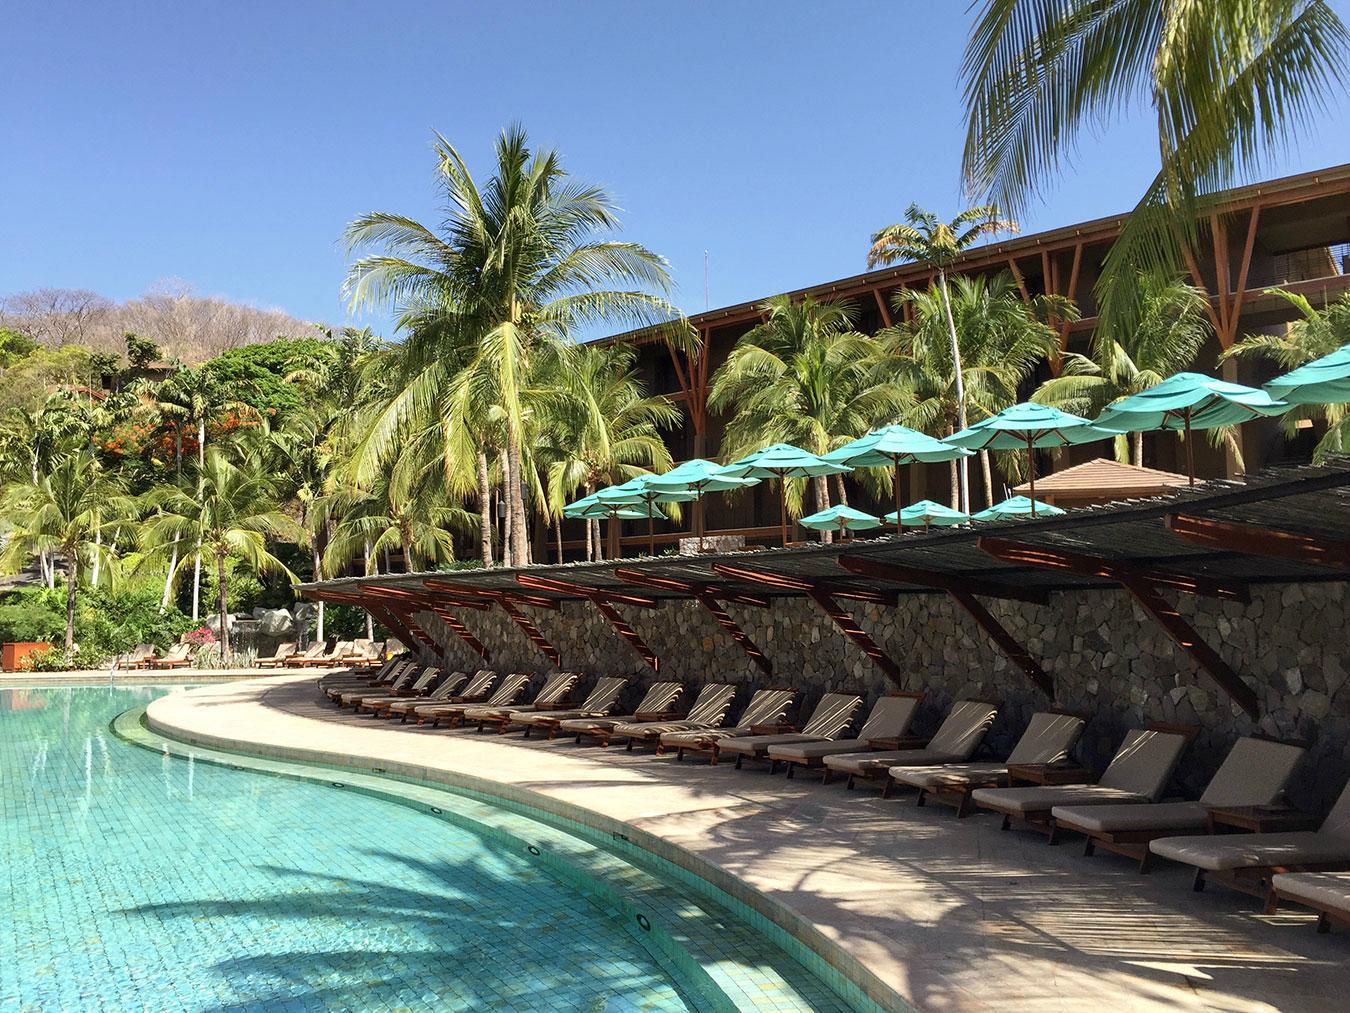 MONTECRISTO Blog: Four Seasons Costa Rica